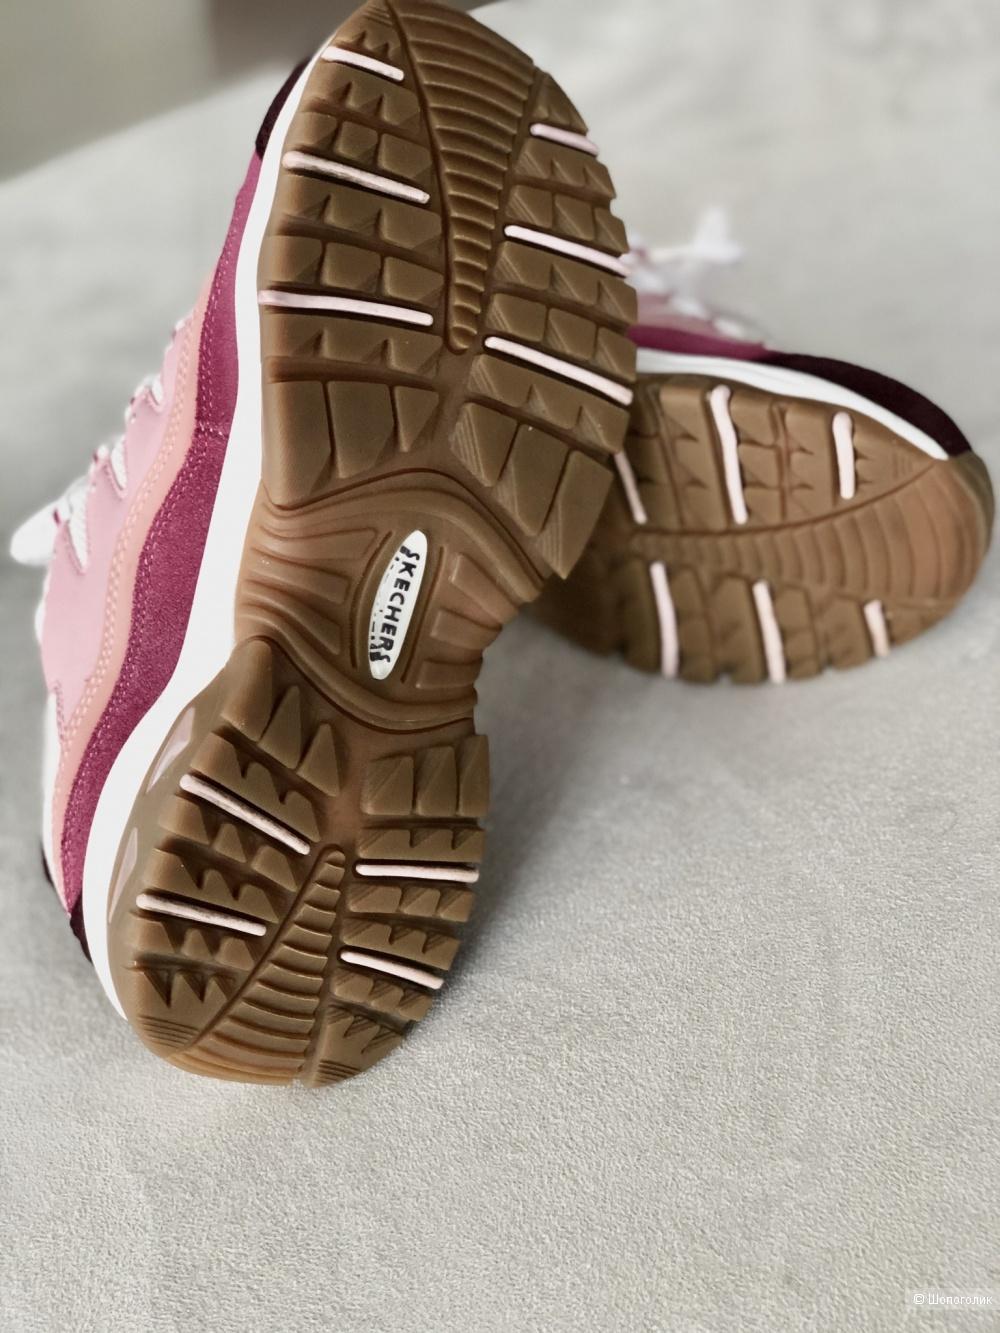 Кроссовки Skechers, размер 37-37,5.